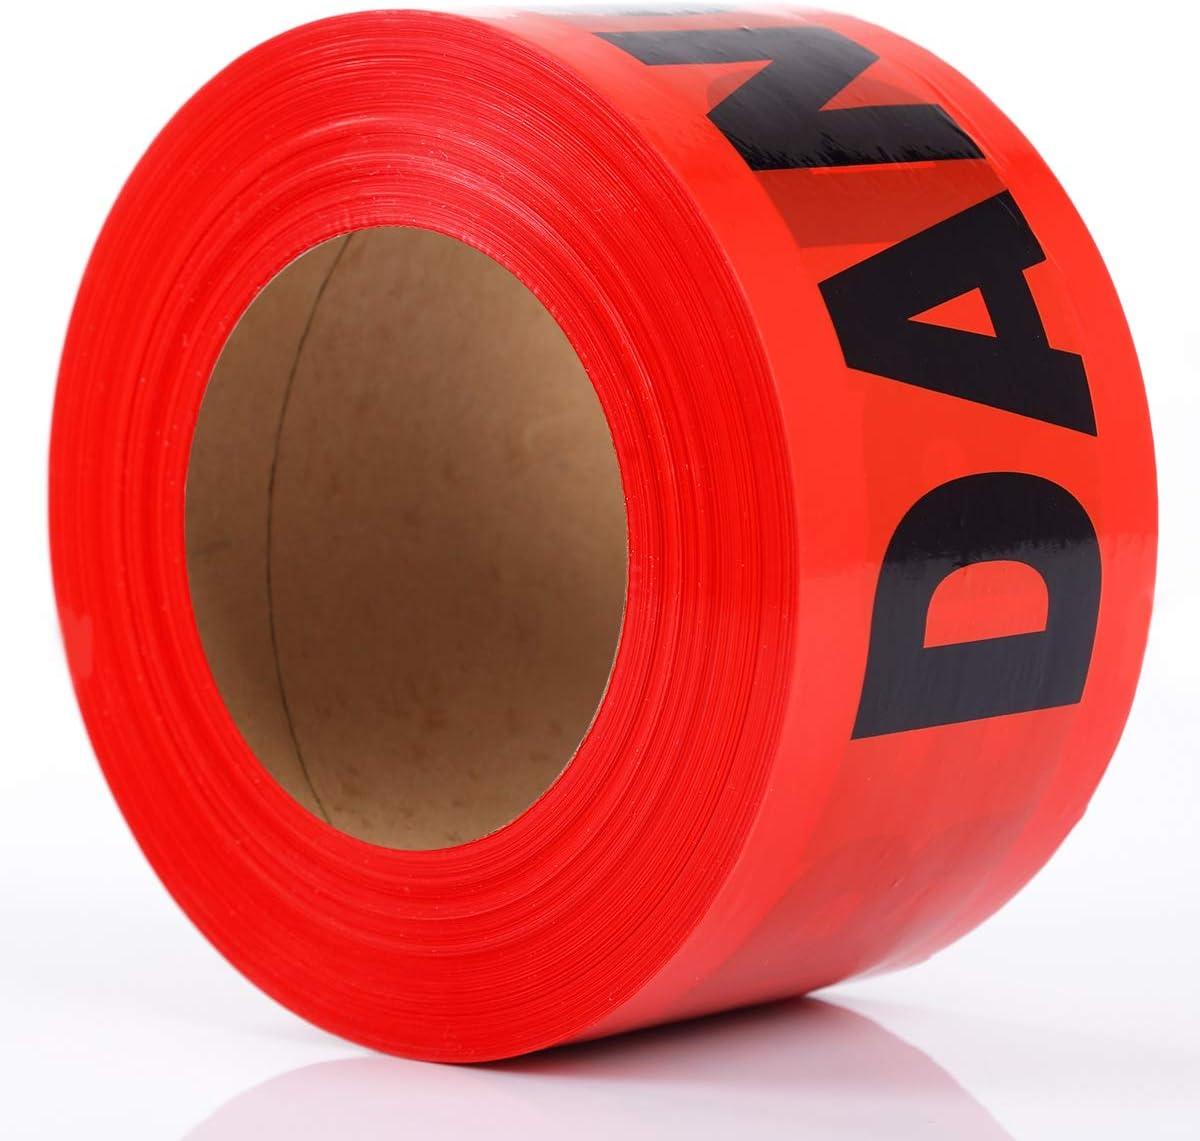 KINGPLAST Red DANGER Tape Roll - 3 Inch 1000 feet Non-Adhesive C